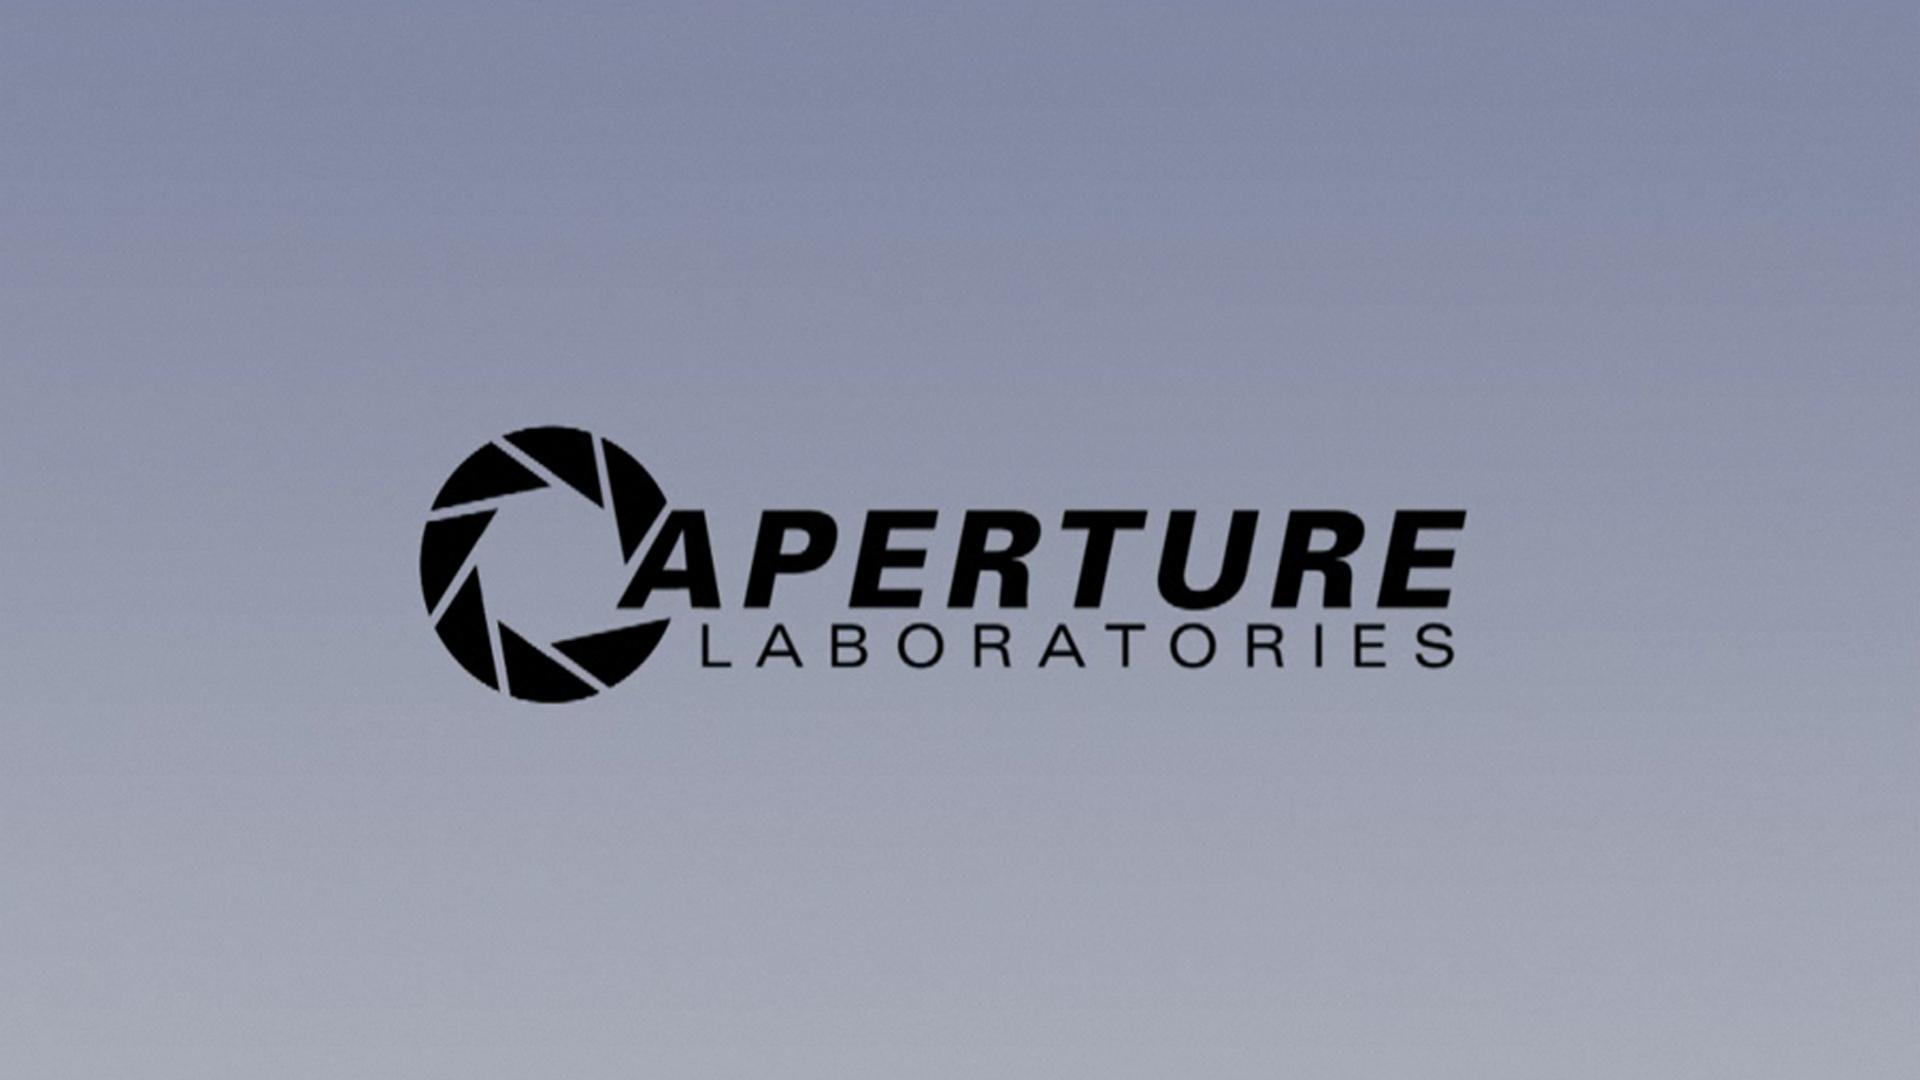 Free Widescreen Wallpaper Fall Download Free Aperture Laboratories Wallpaper Pixelstalk Net